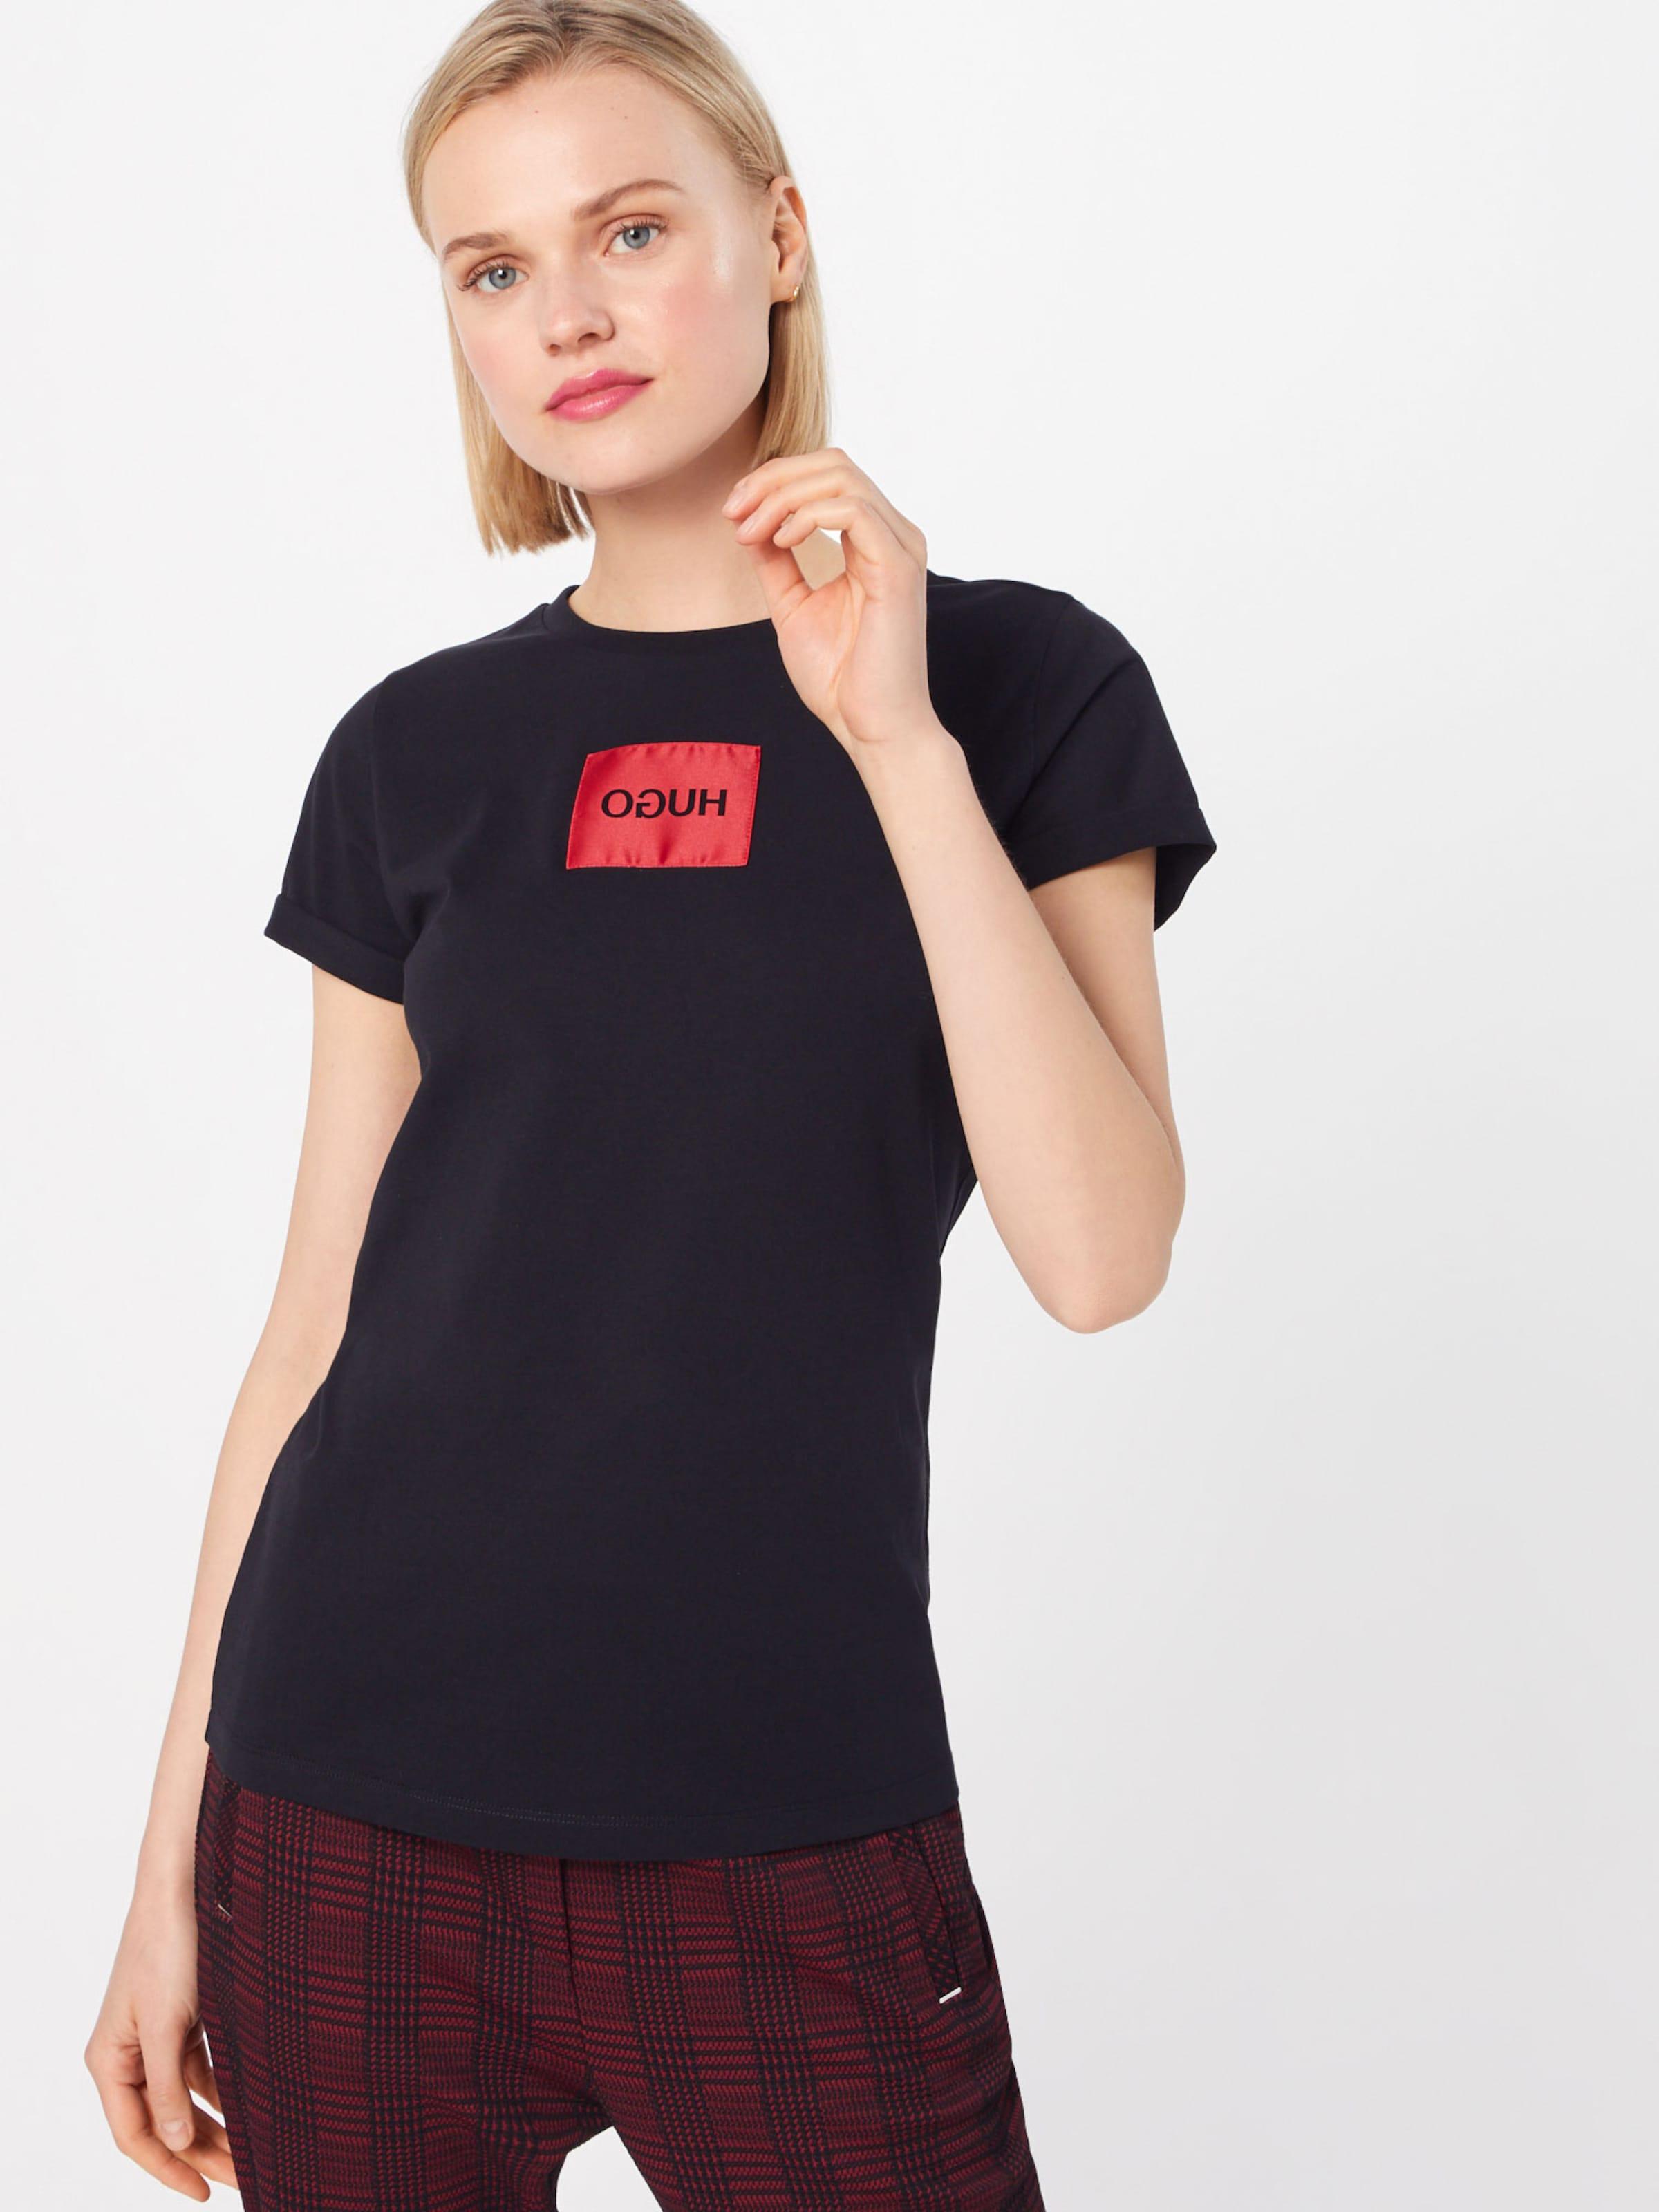 'dennja' T Blanc shirt En Hugo 4jAL5R